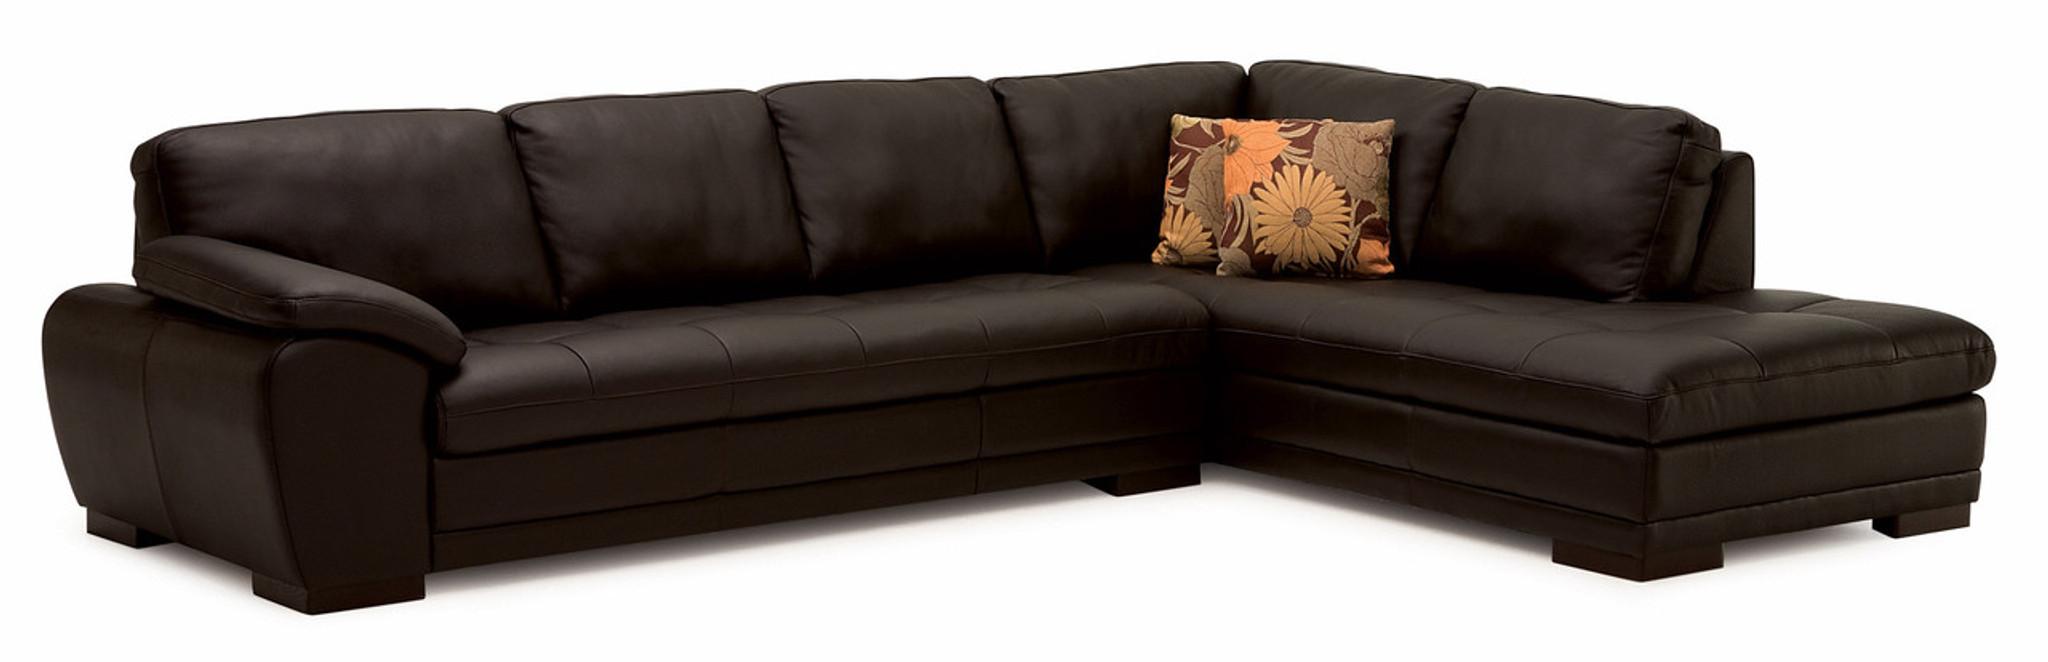 Palliser Leather Sofa Sectional Model 77319 Miami Leather